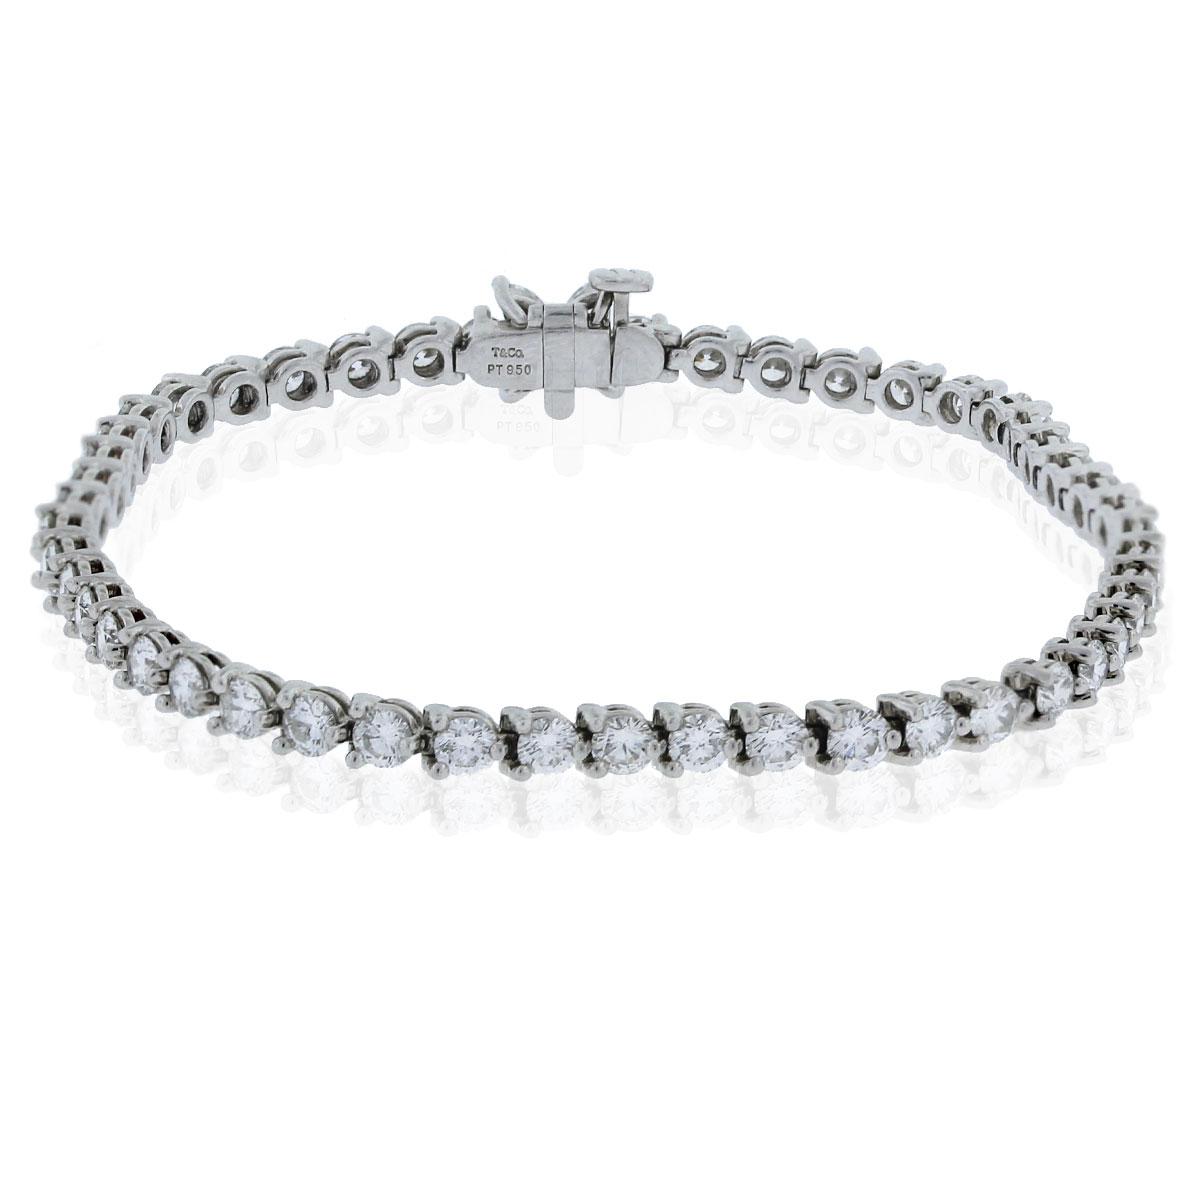 Tiffany  Co Victoria Line Platinum  Diamond Tennis Bracelet